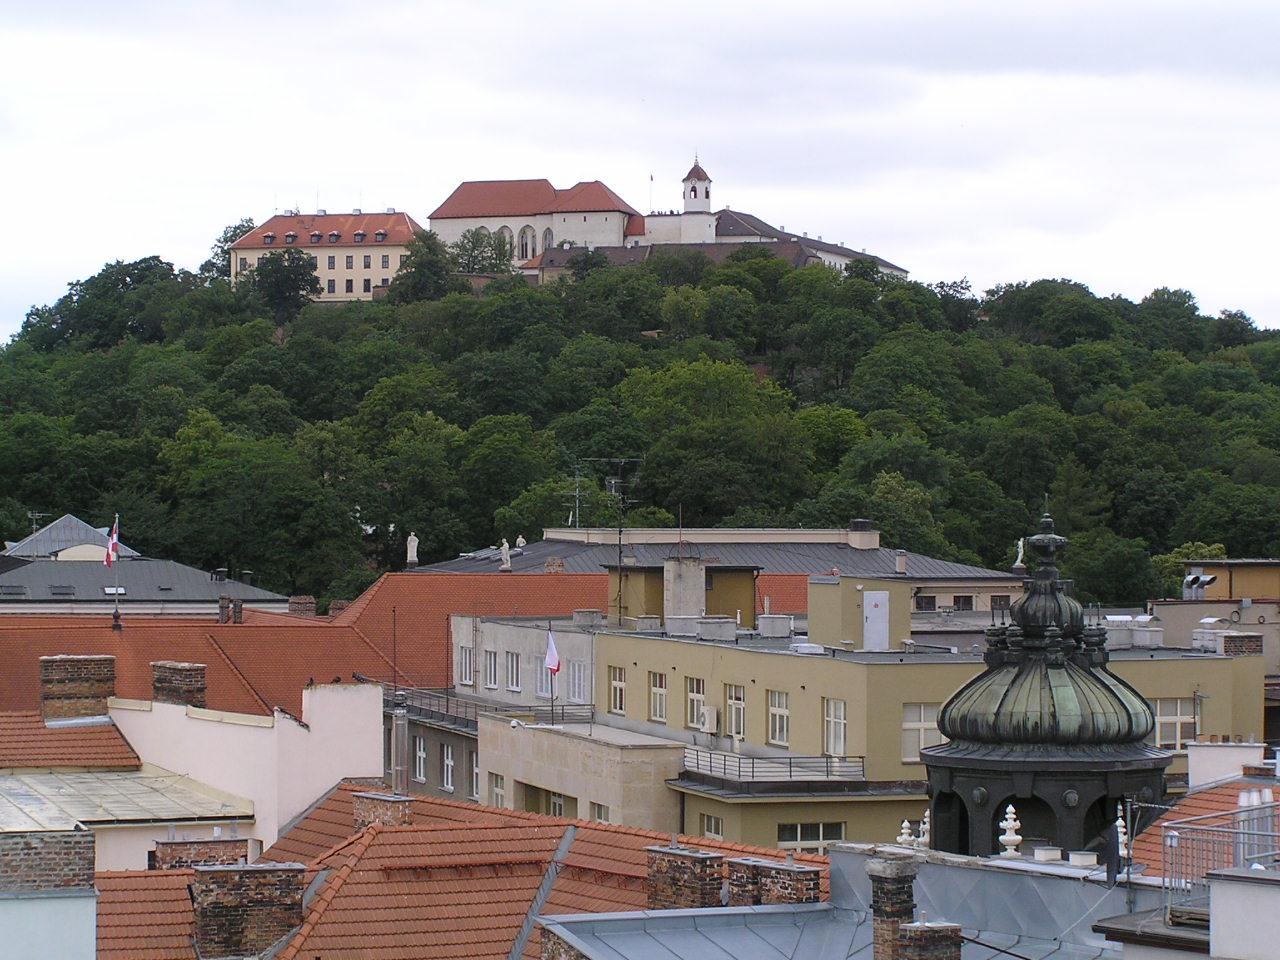 Brno Spilberk